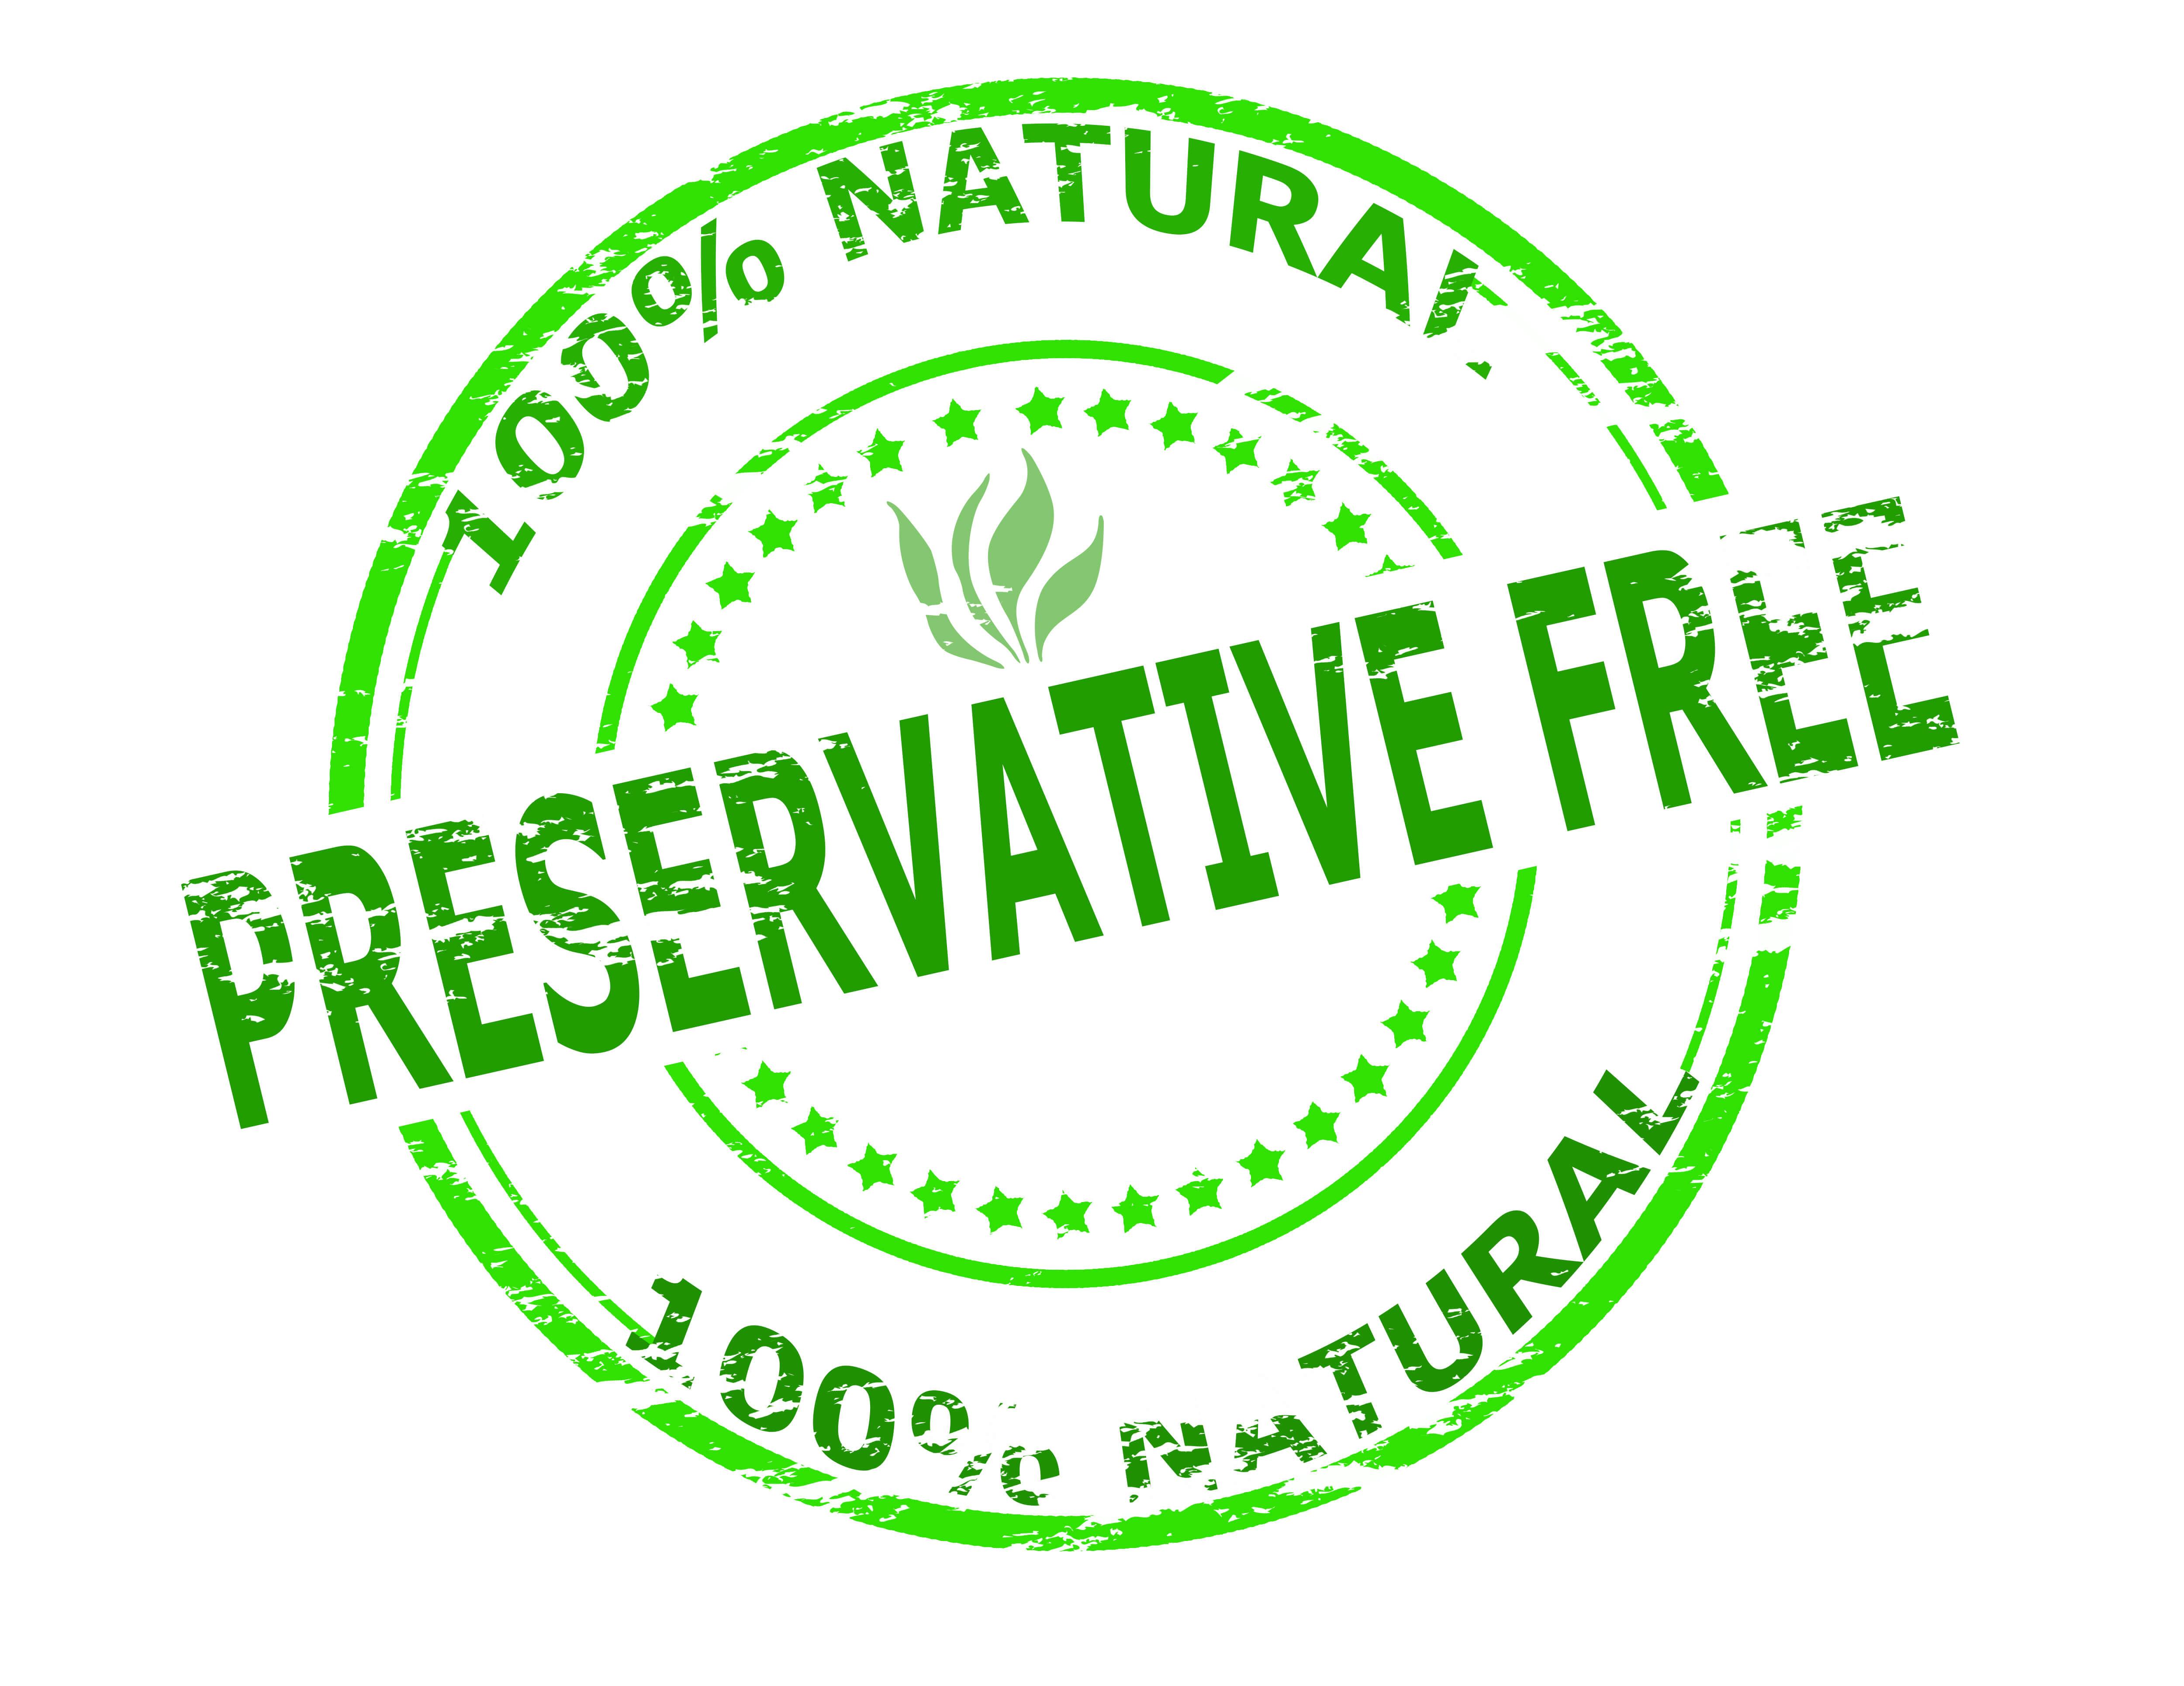 Preservative-free label